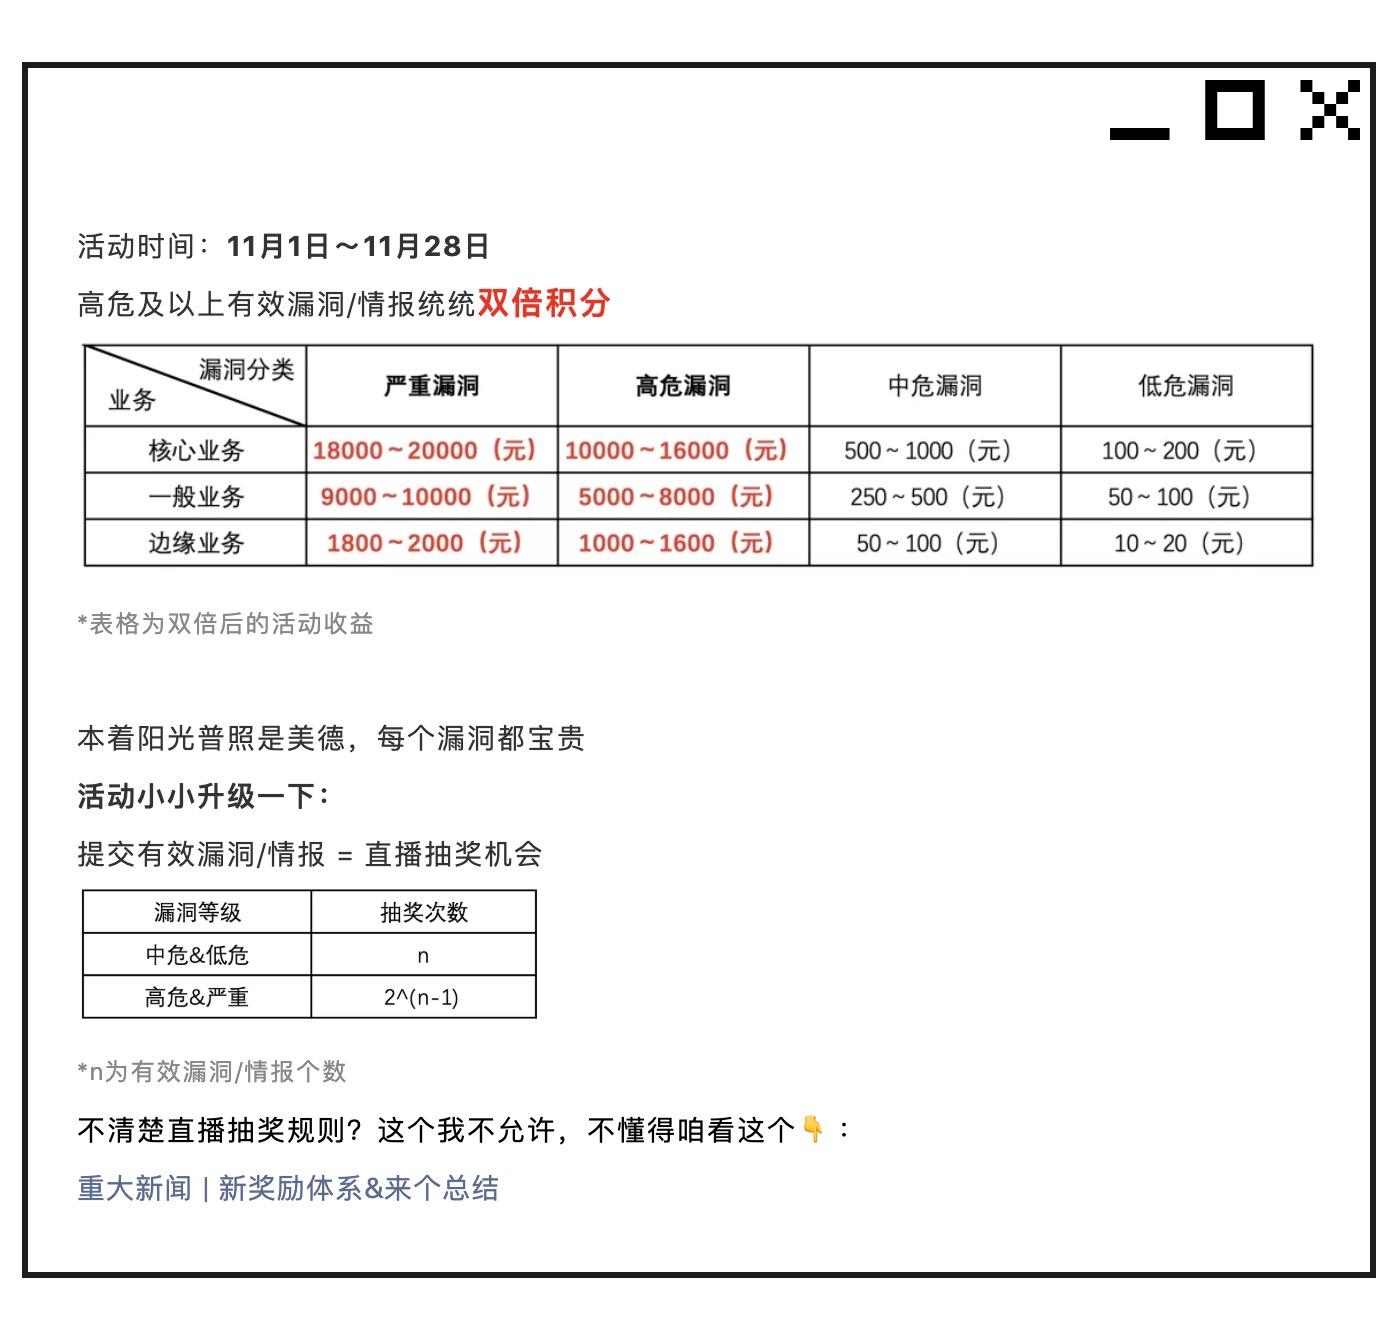 https://momo-mmsrc.oss-cn-hangzhou.aliyuncs.com/img-97b8c3b3-106a-3191-82ee-084a250e0162.jpeg